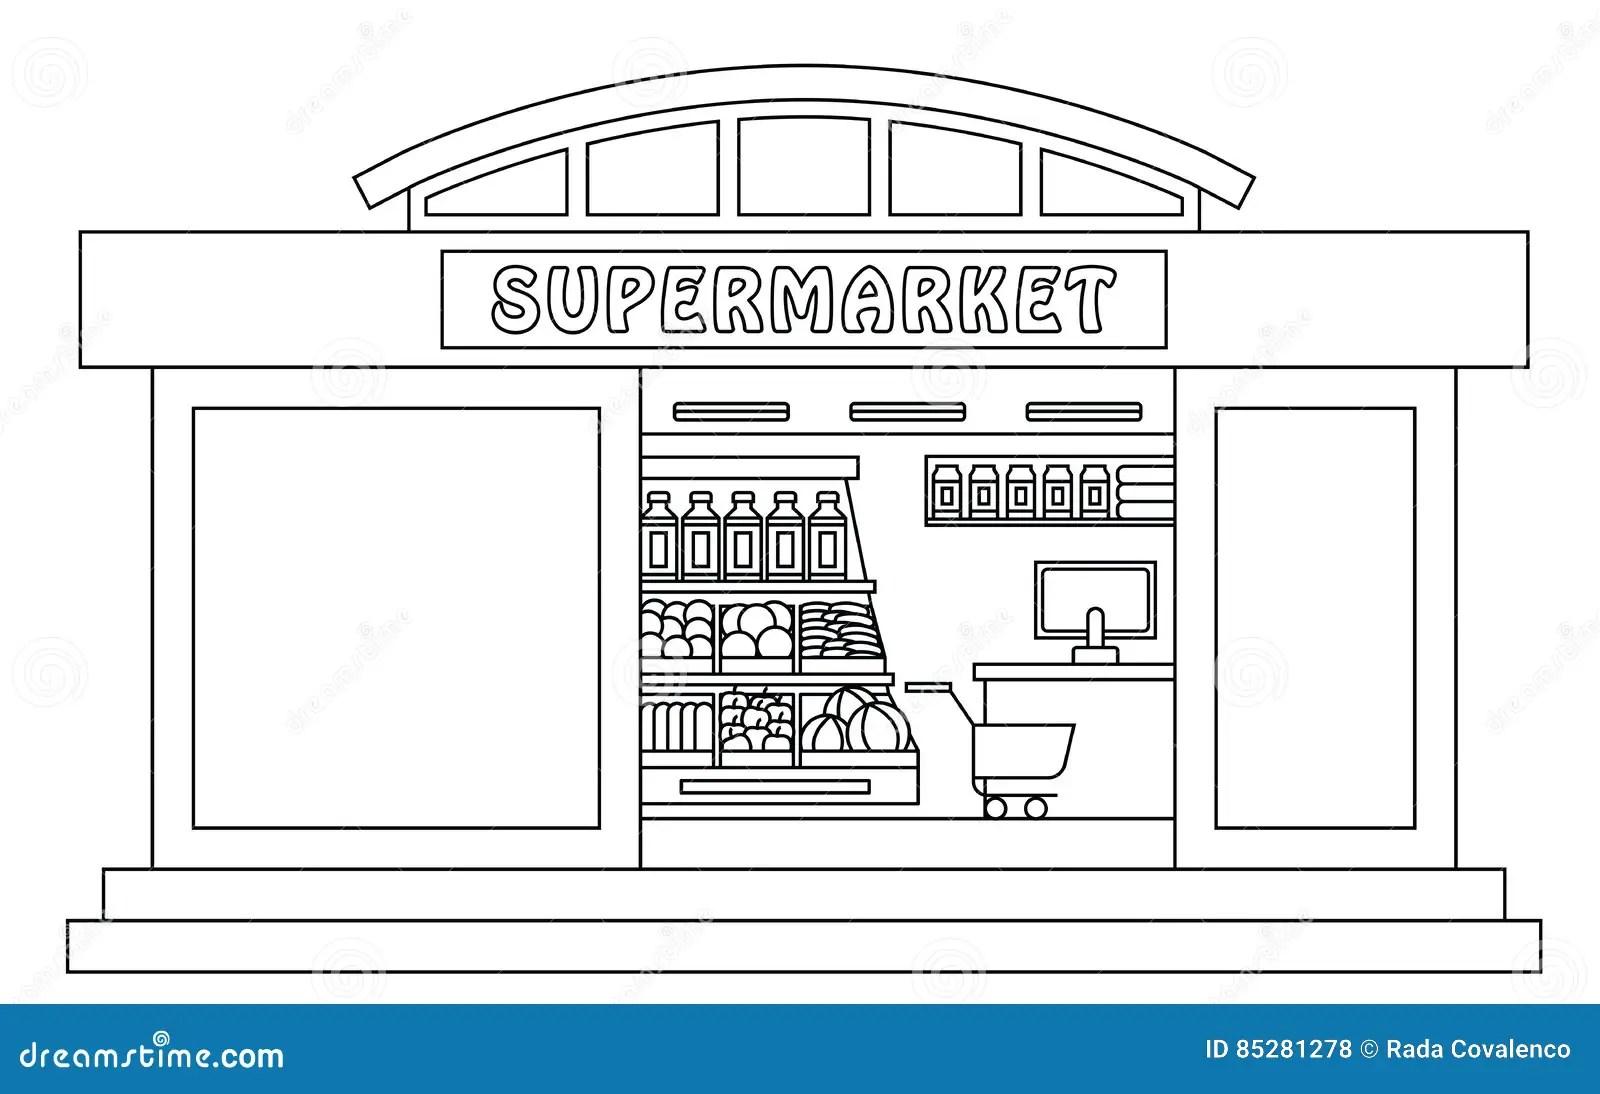 Supermarket Outline Illustration Stock Illustration